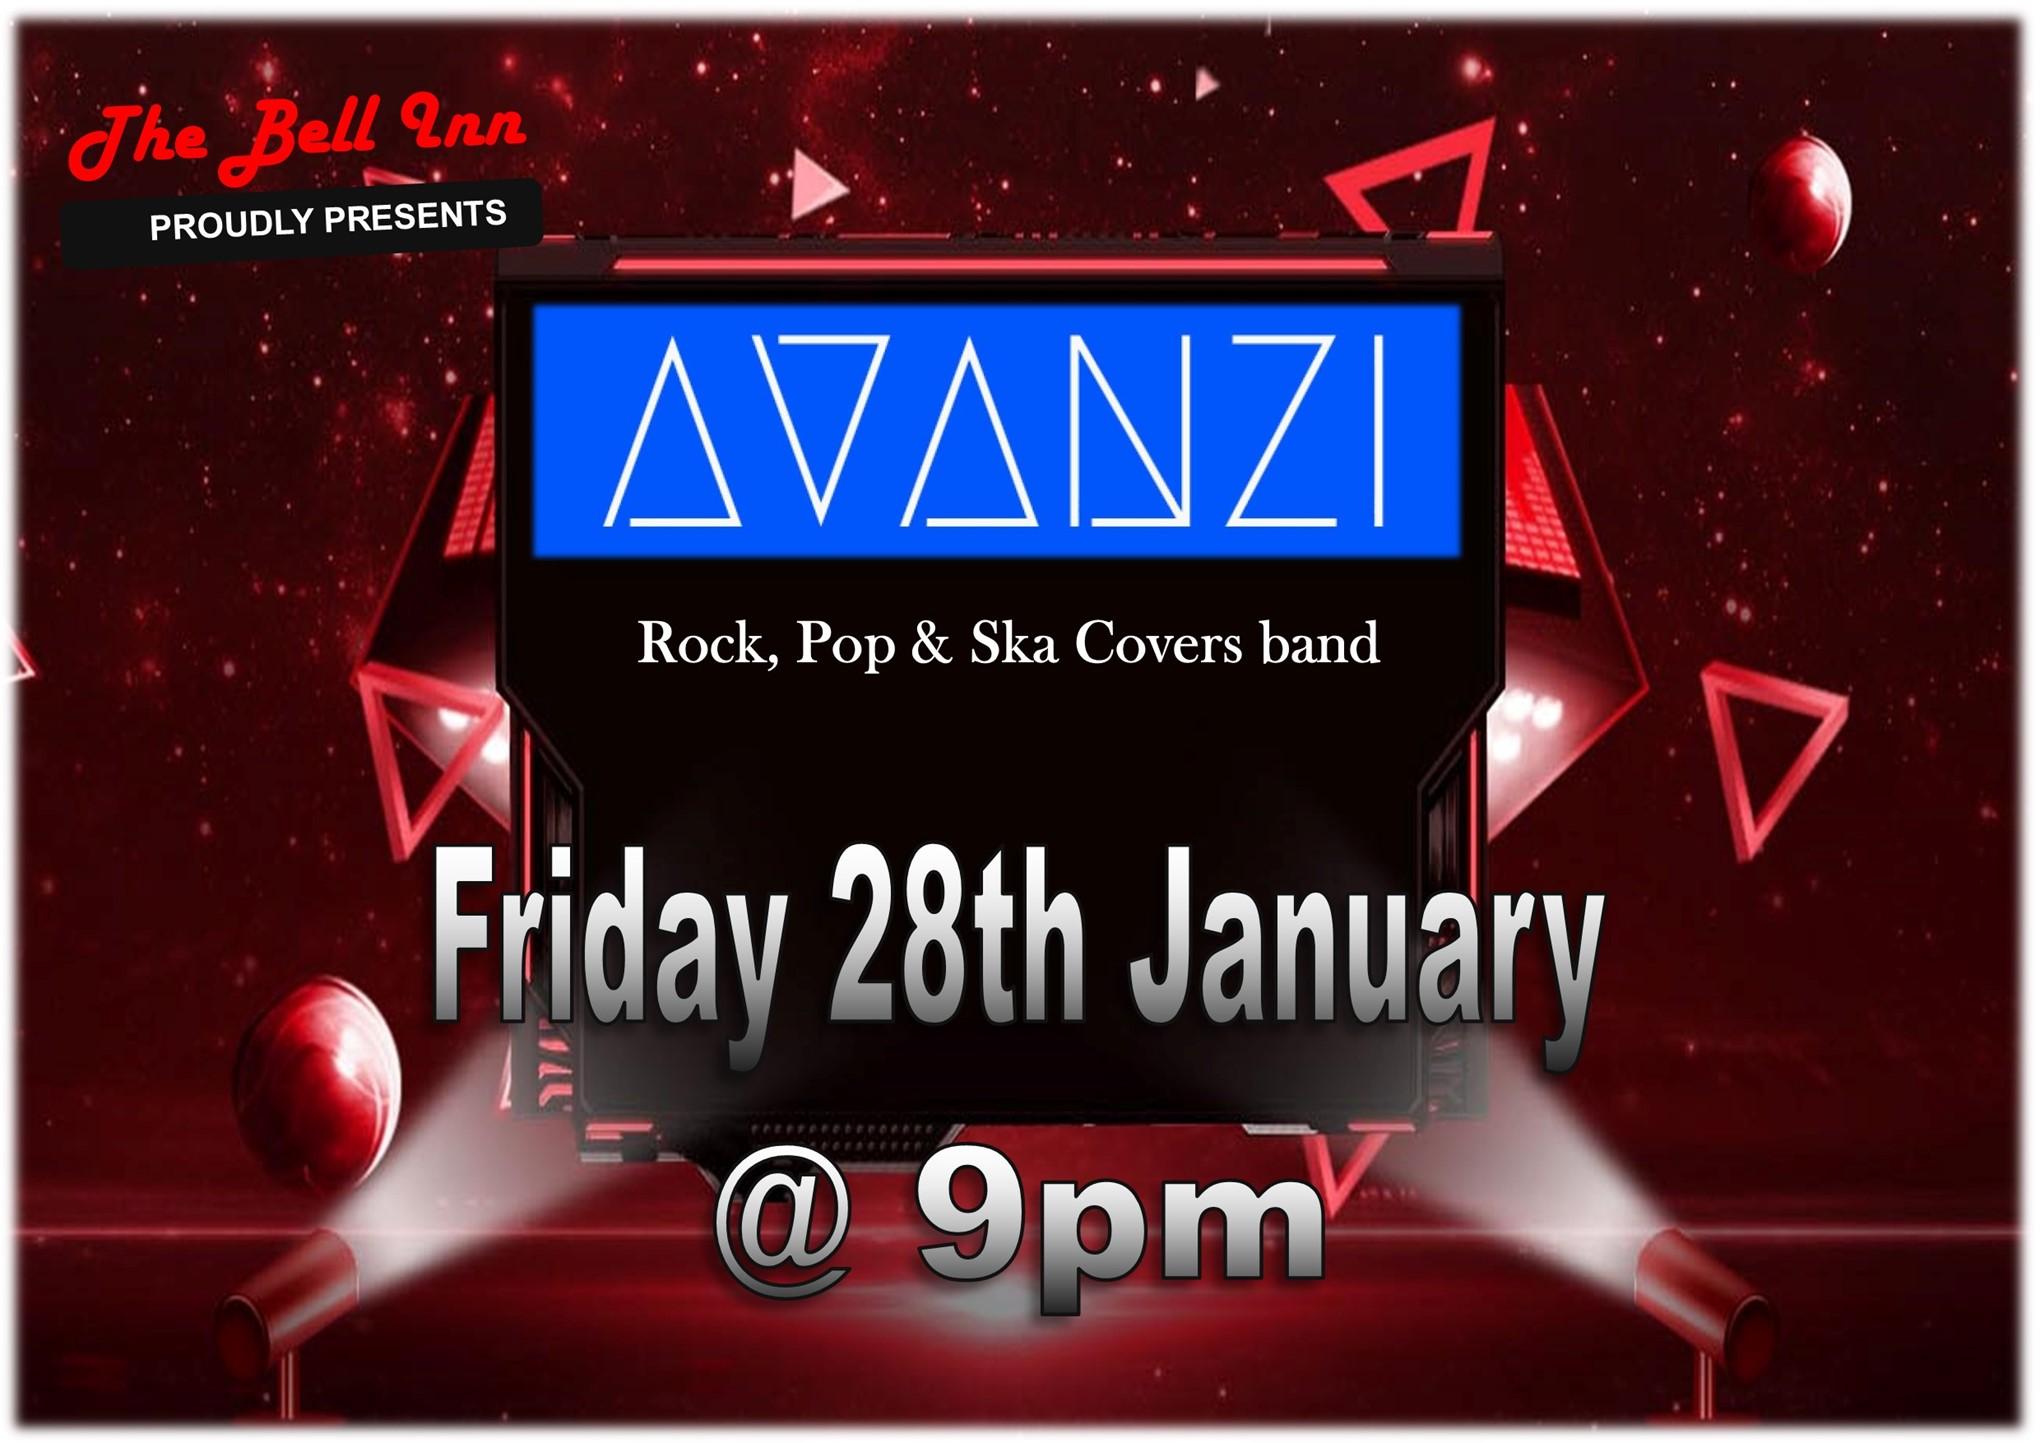 Live Music with Avanzi